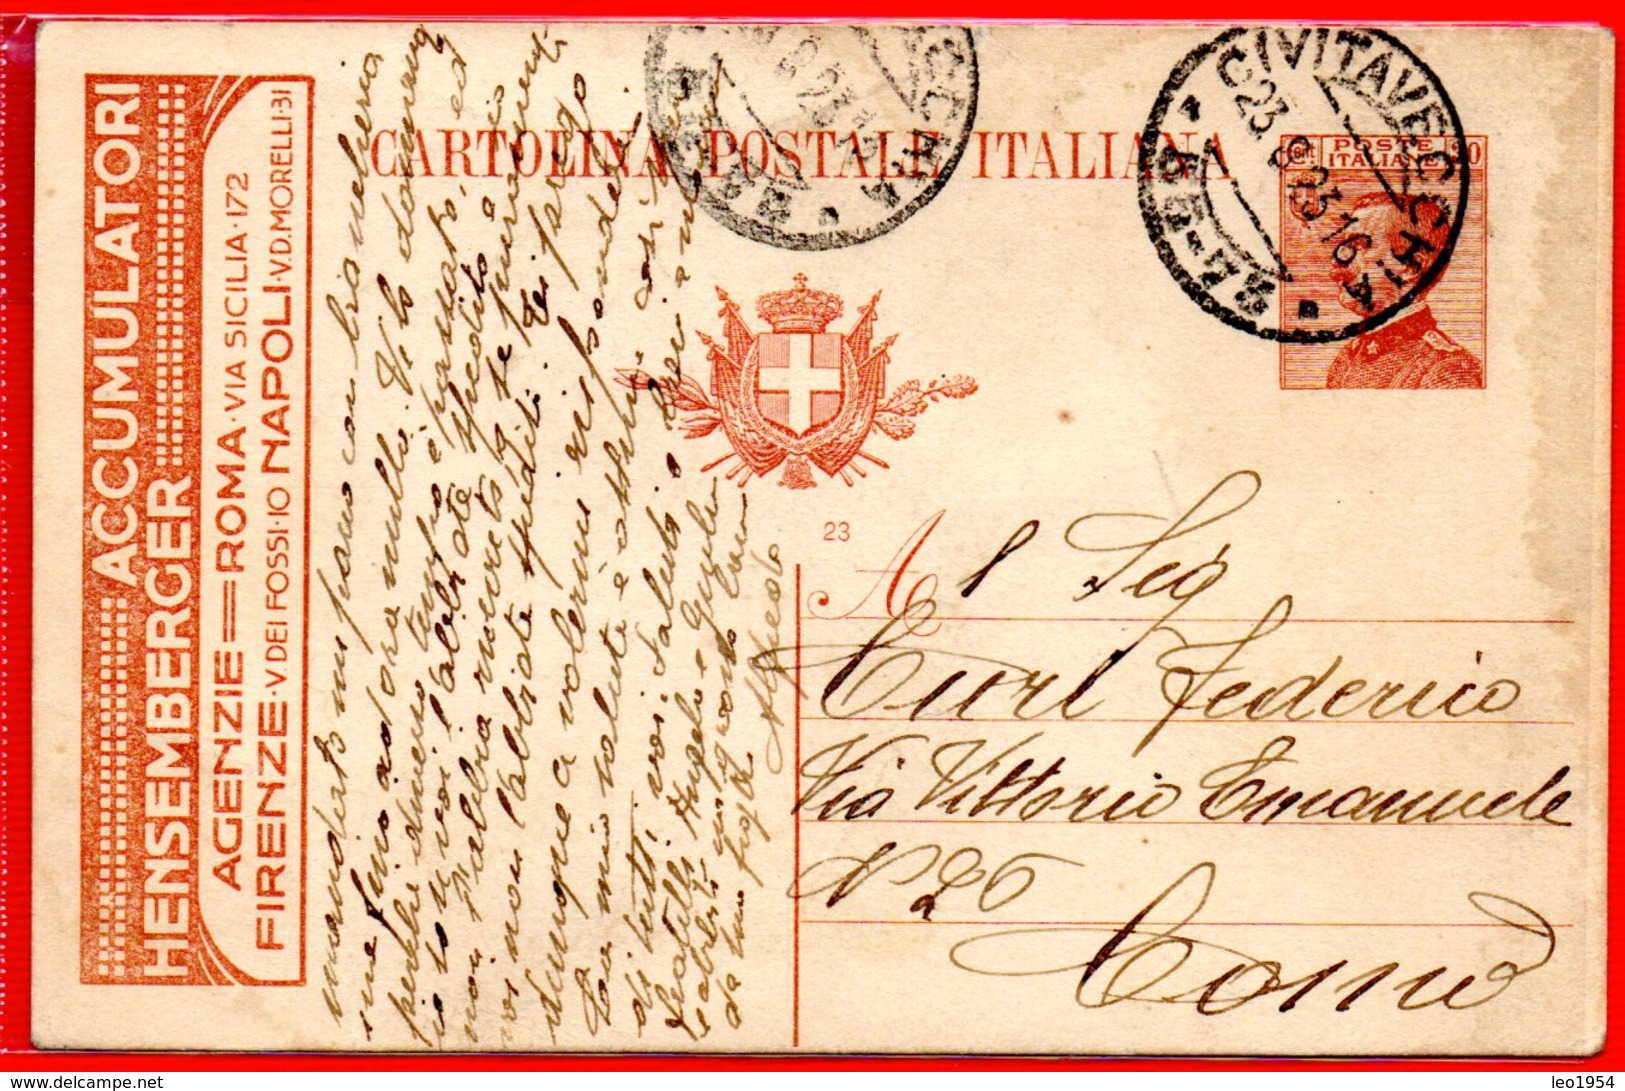 1923 - RARA CARTOLINA POSTALE PUBBLICITARIA ACCUMULATORI HENSEMBERGER - INTERO POSTALE - Interi Postali